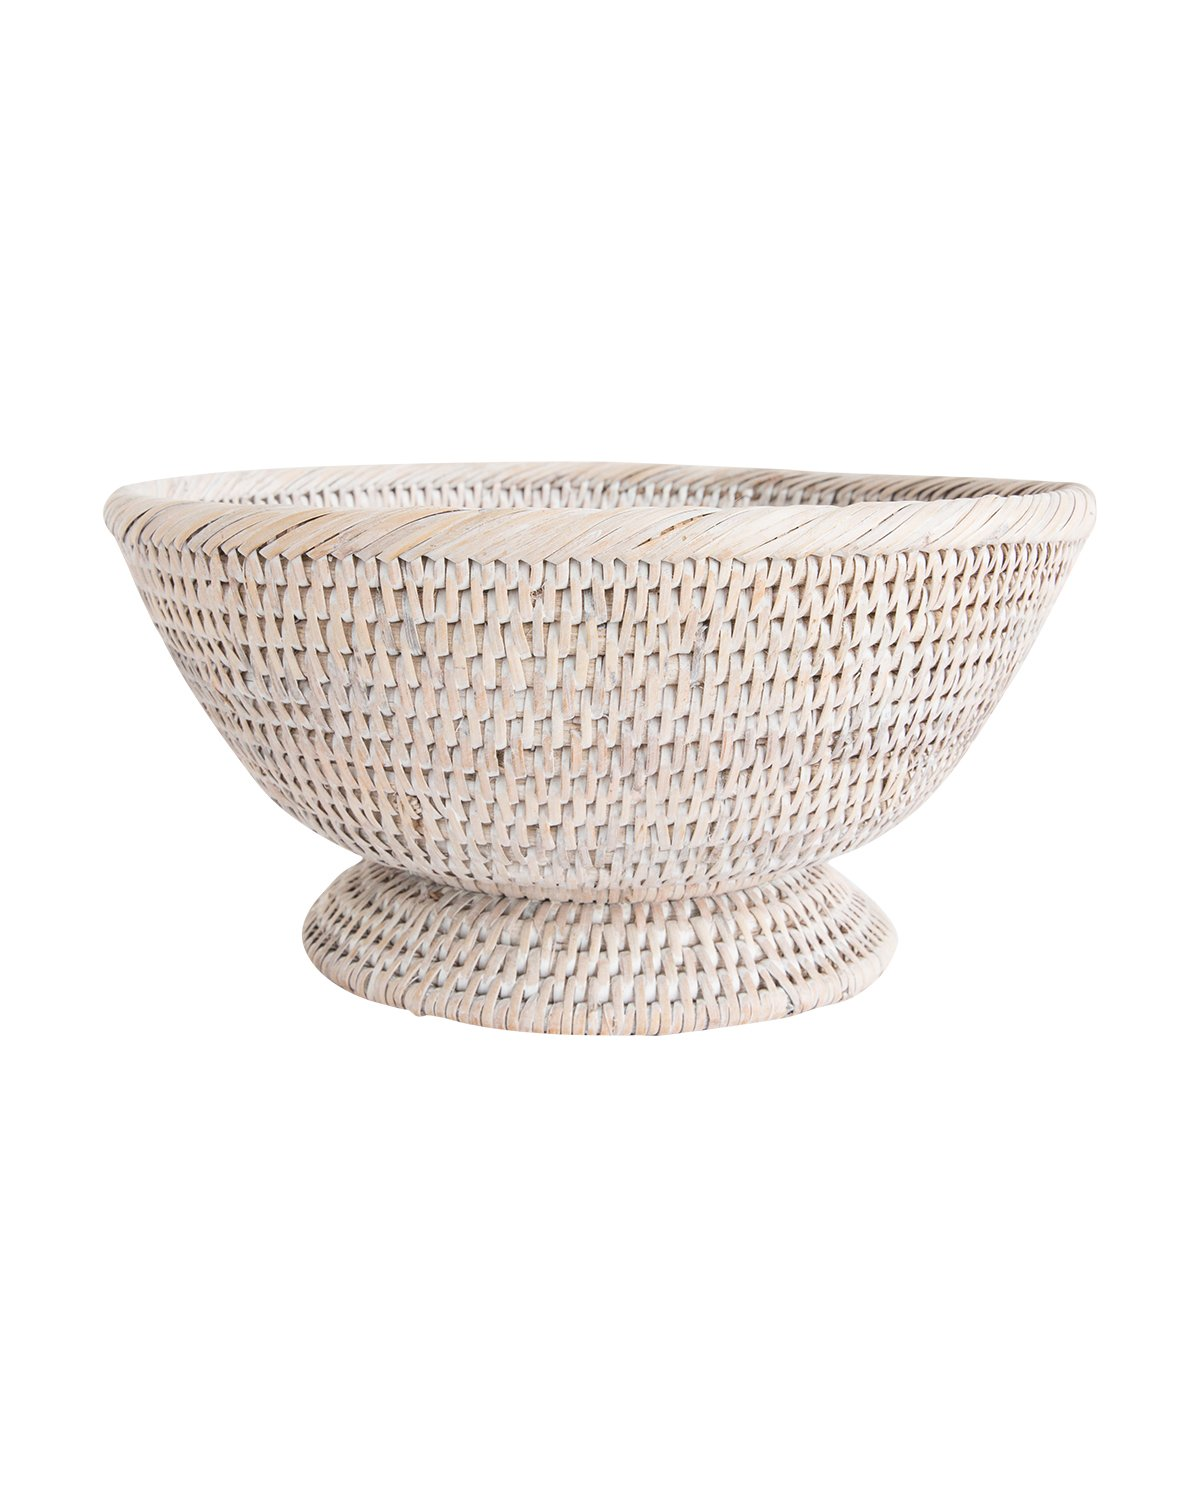 Pedestal_Bowl_1.jpg